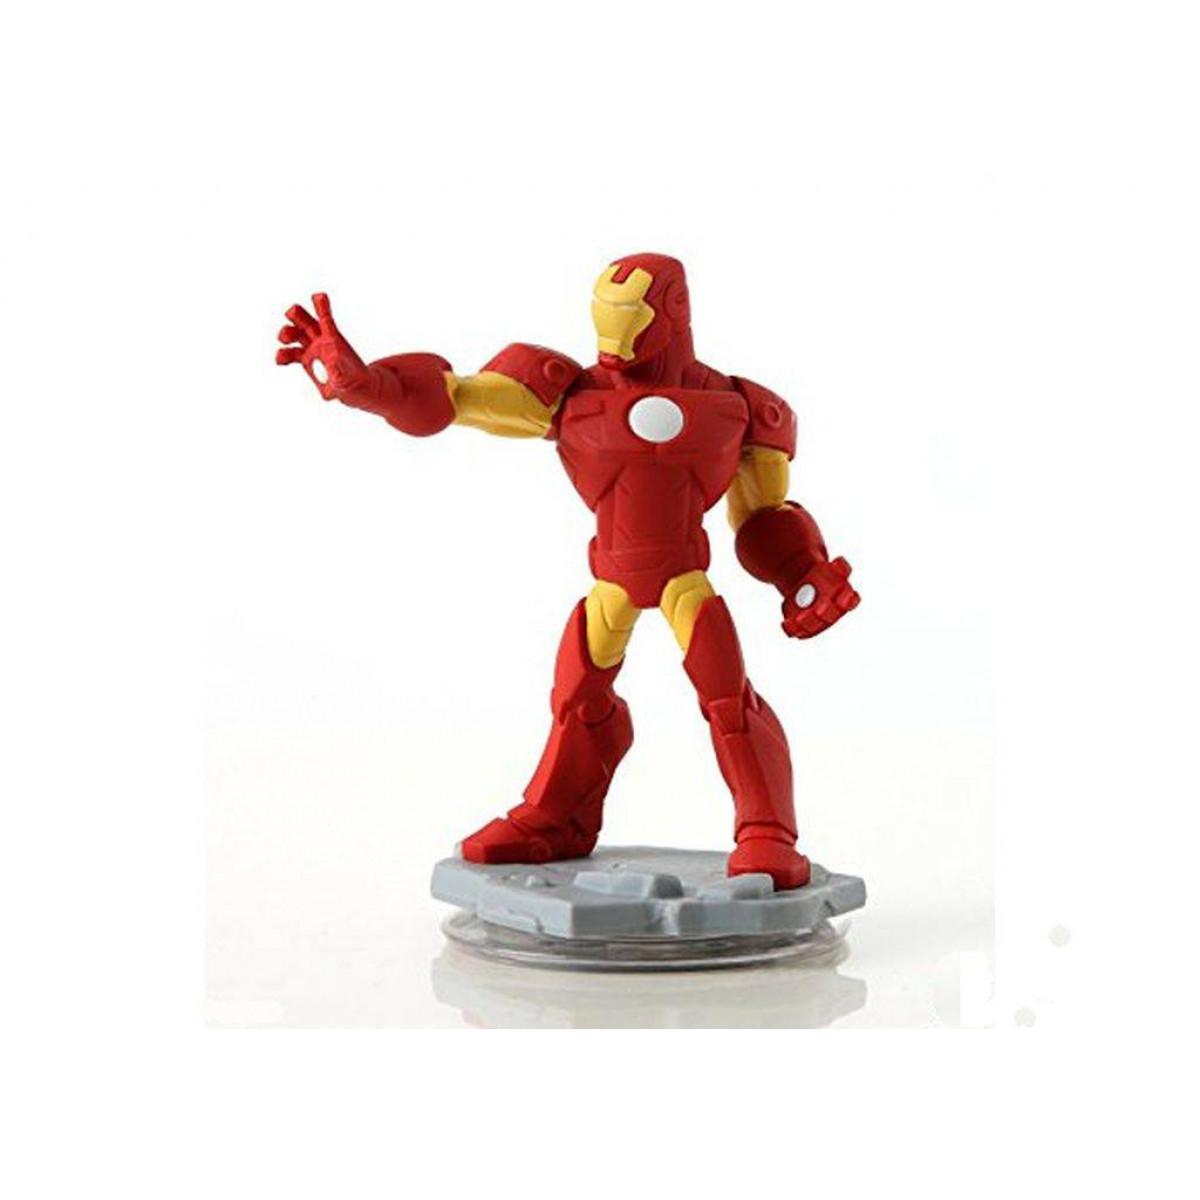 Disney Infinity 2.0 - Iron Man játékfigura